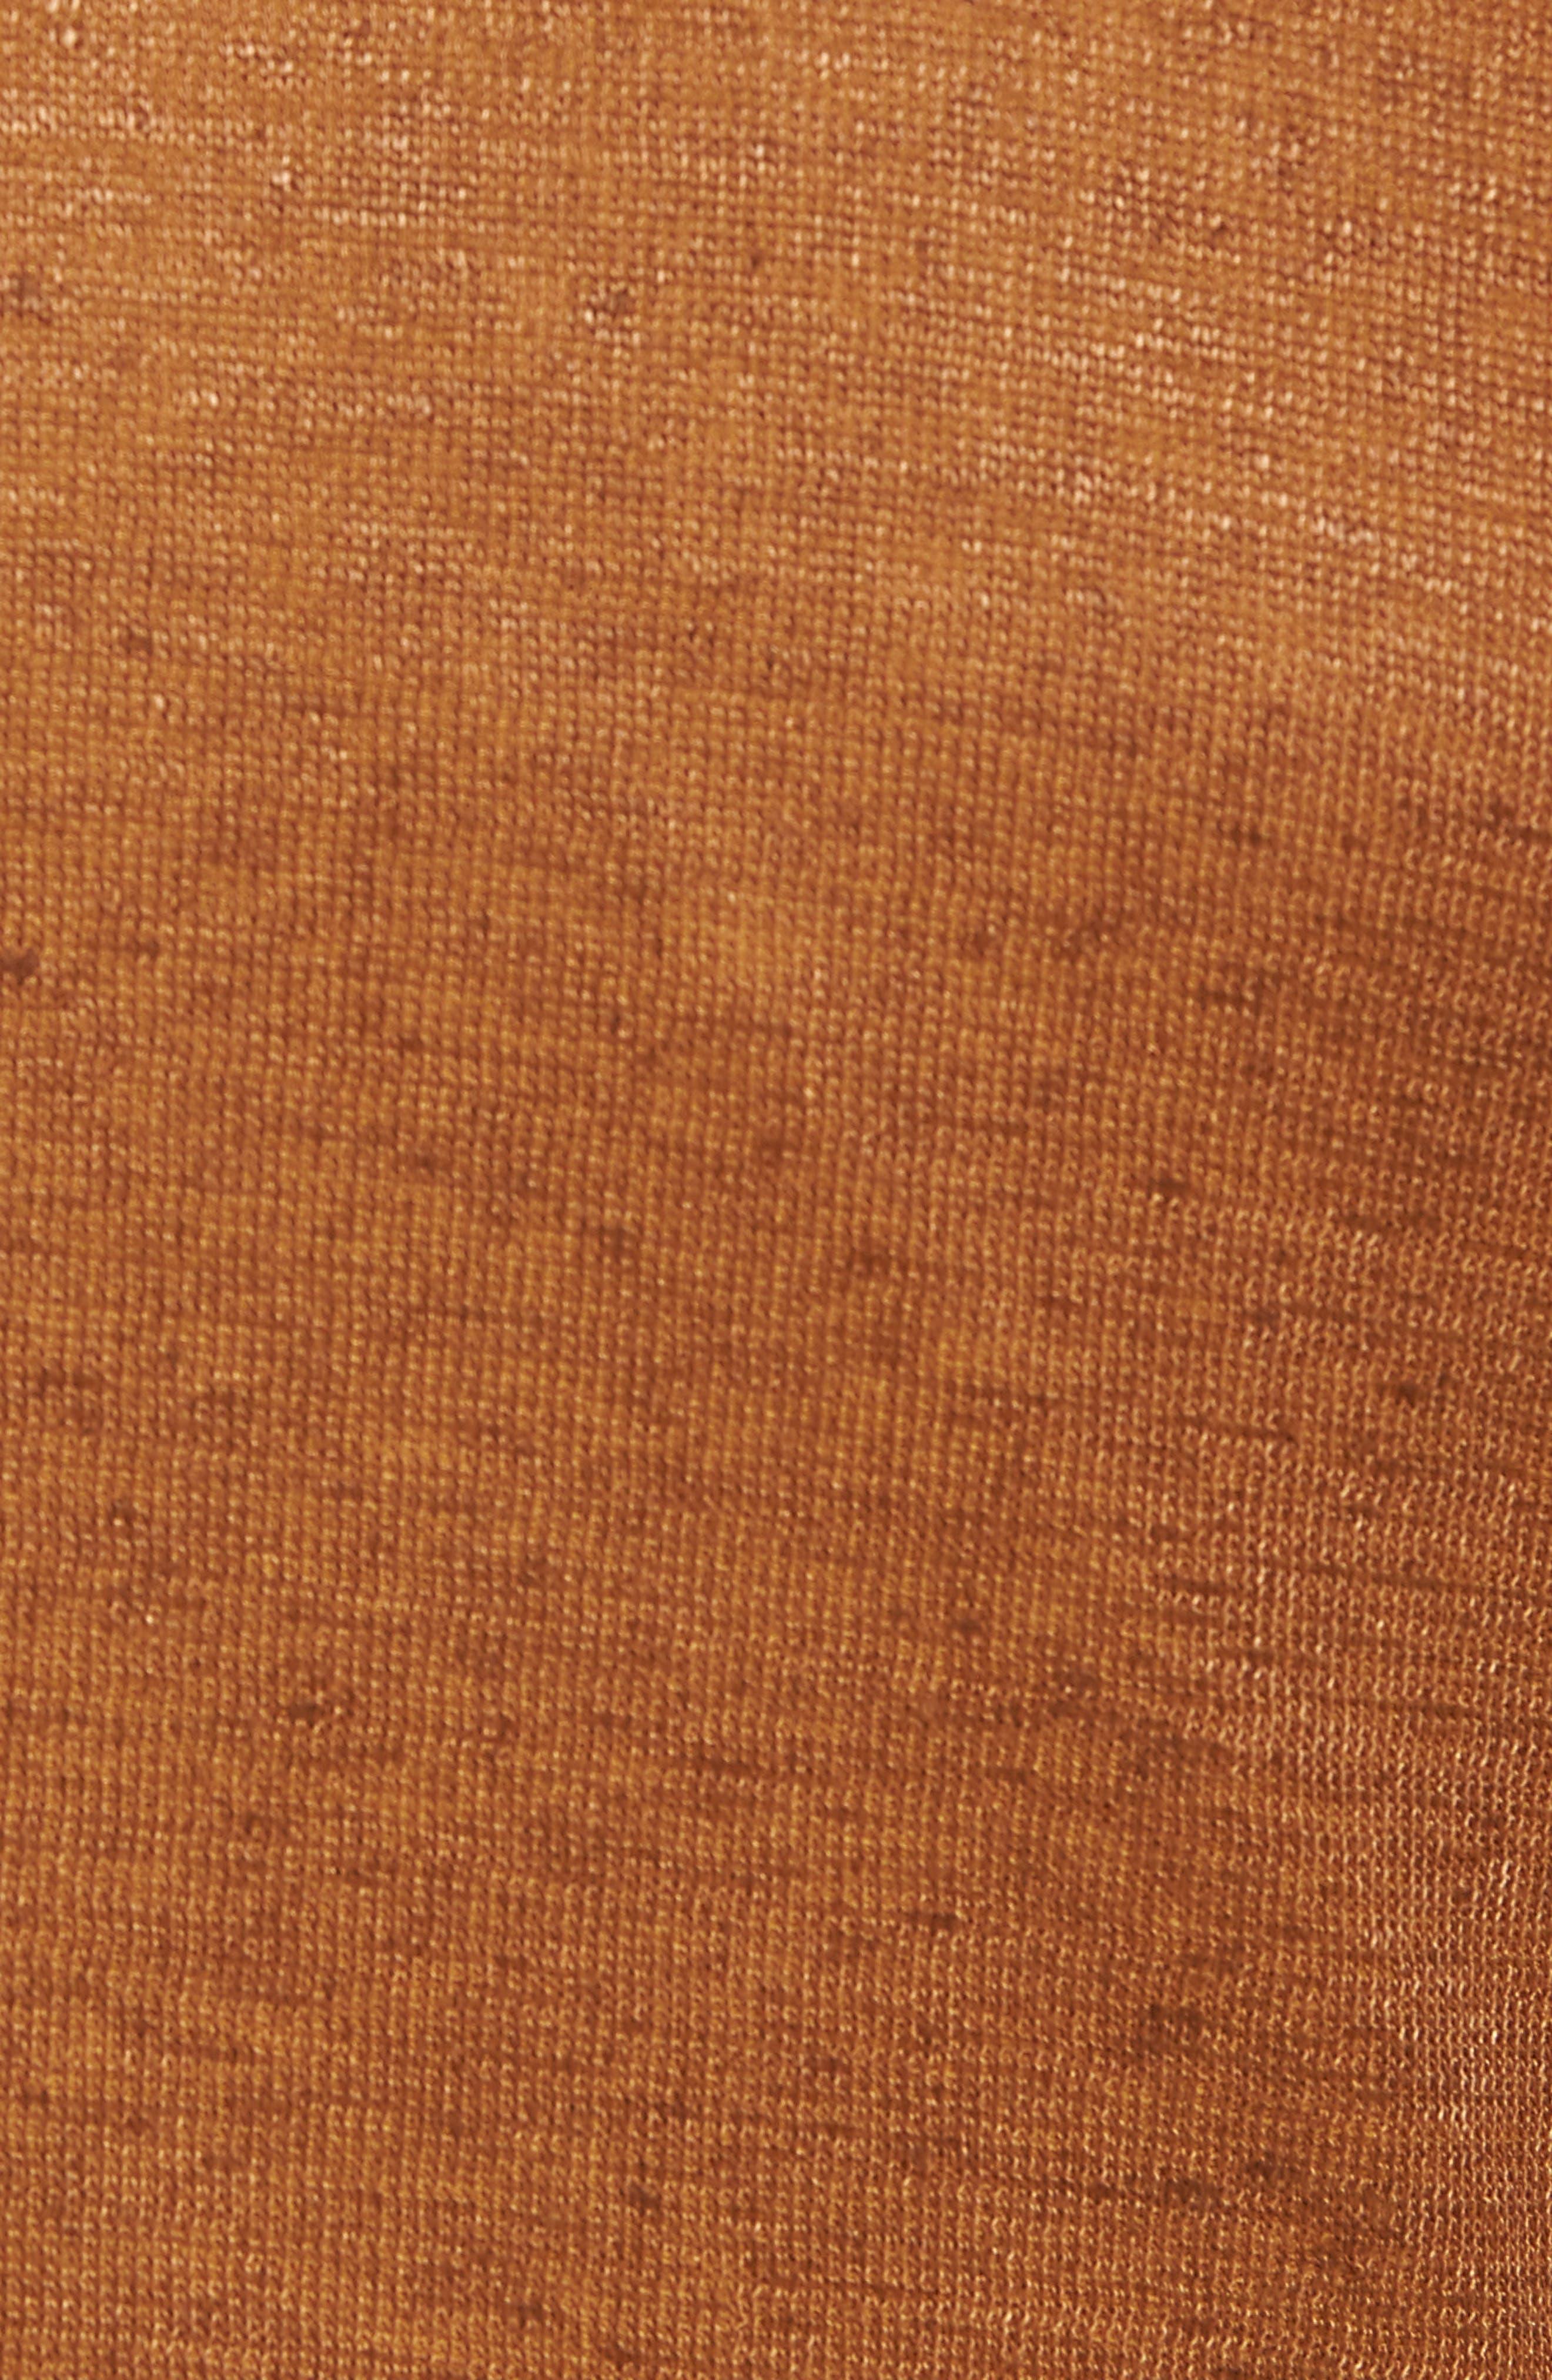 Trim Fit Heathered Jersey Blazer,                             Alternate thumbnail 6, color,                             801